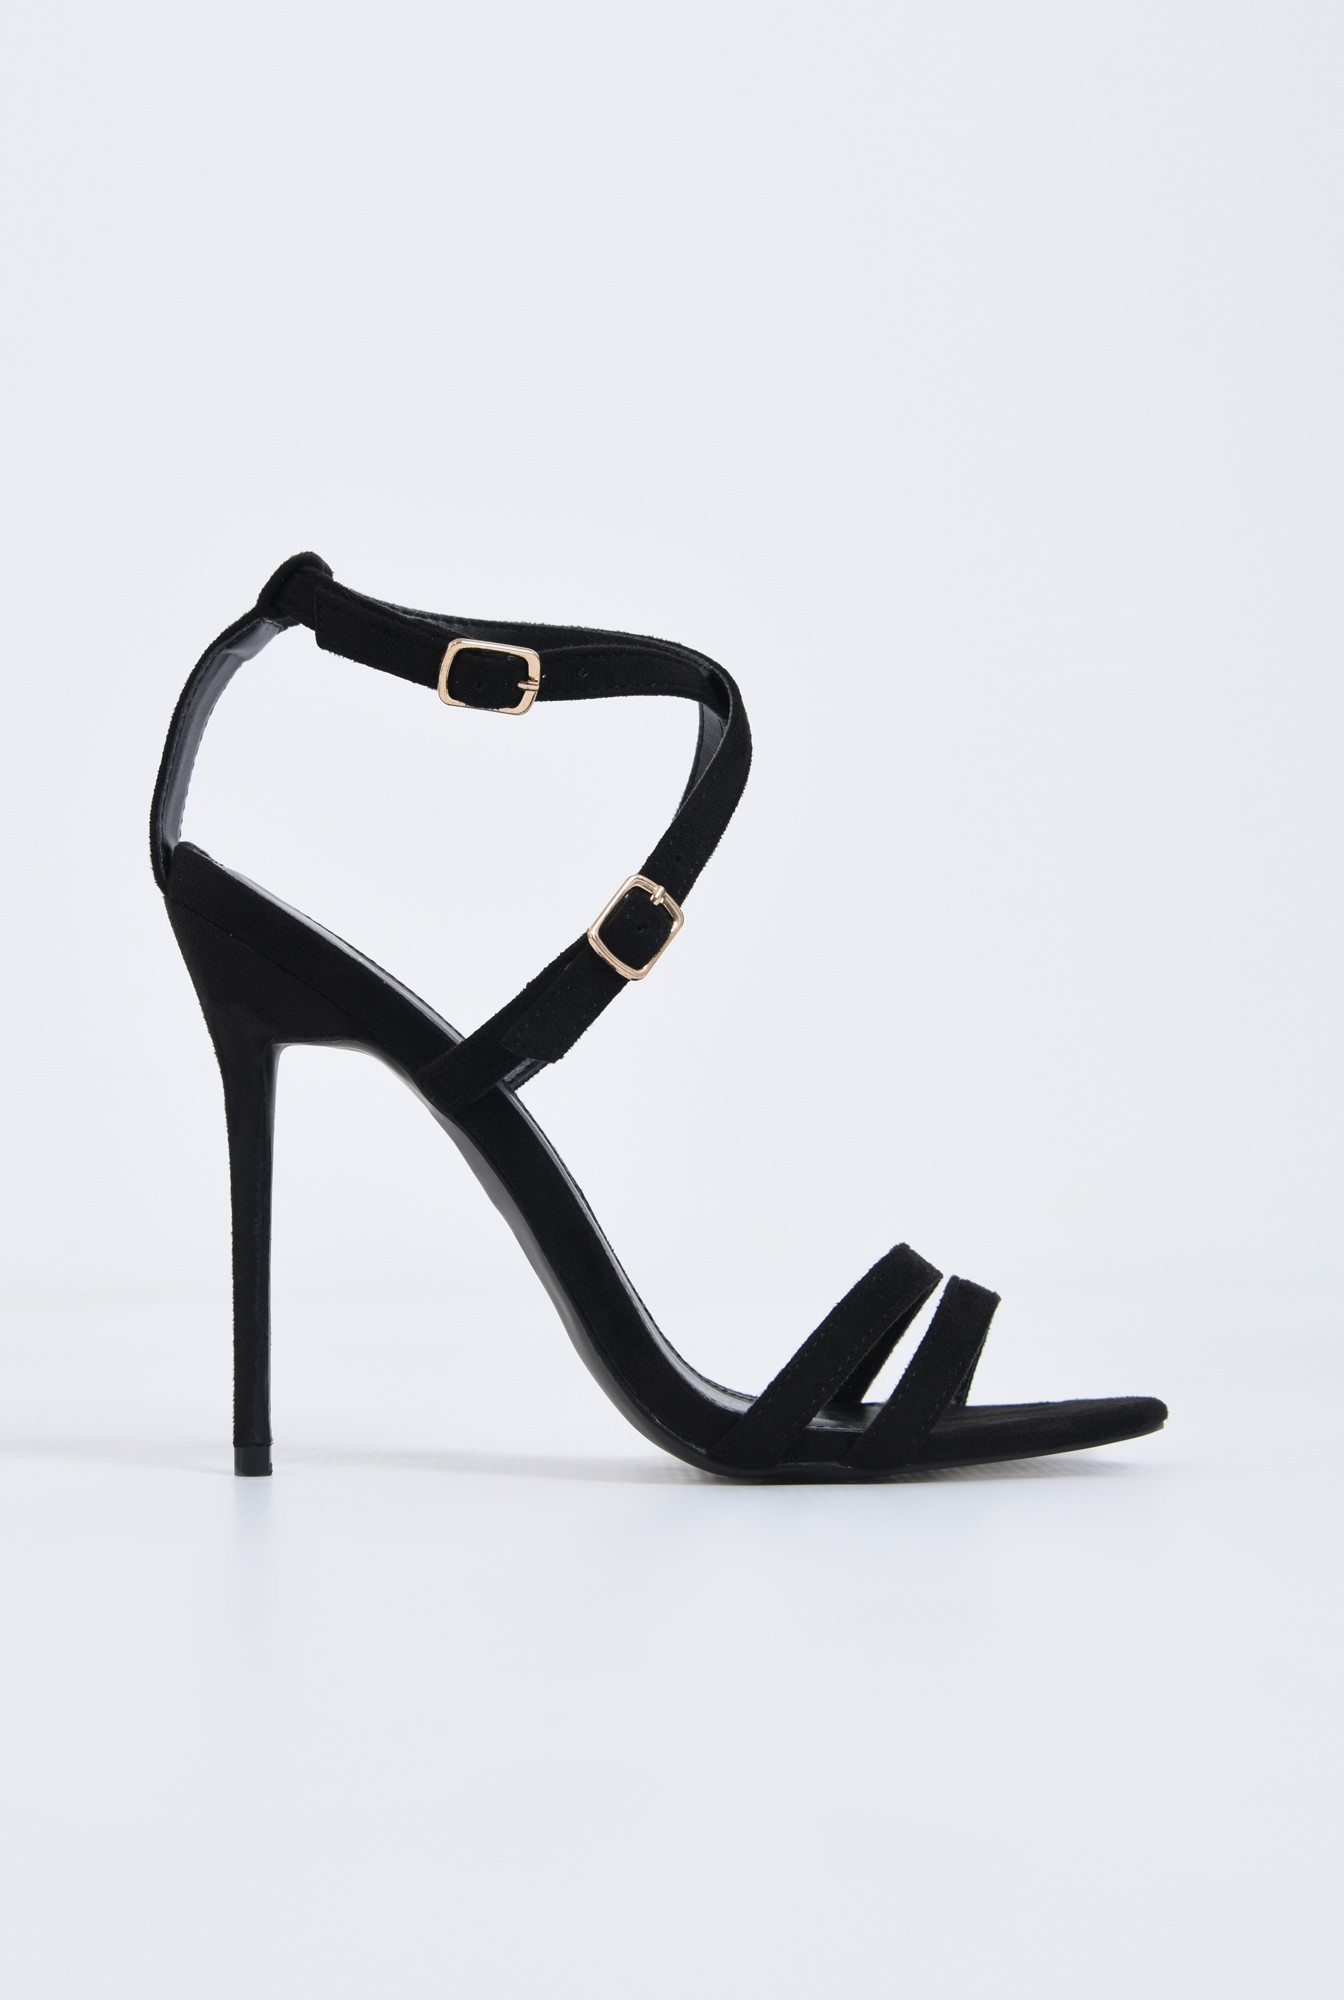 0 - sandale elegante, negru, stiletto, catifea